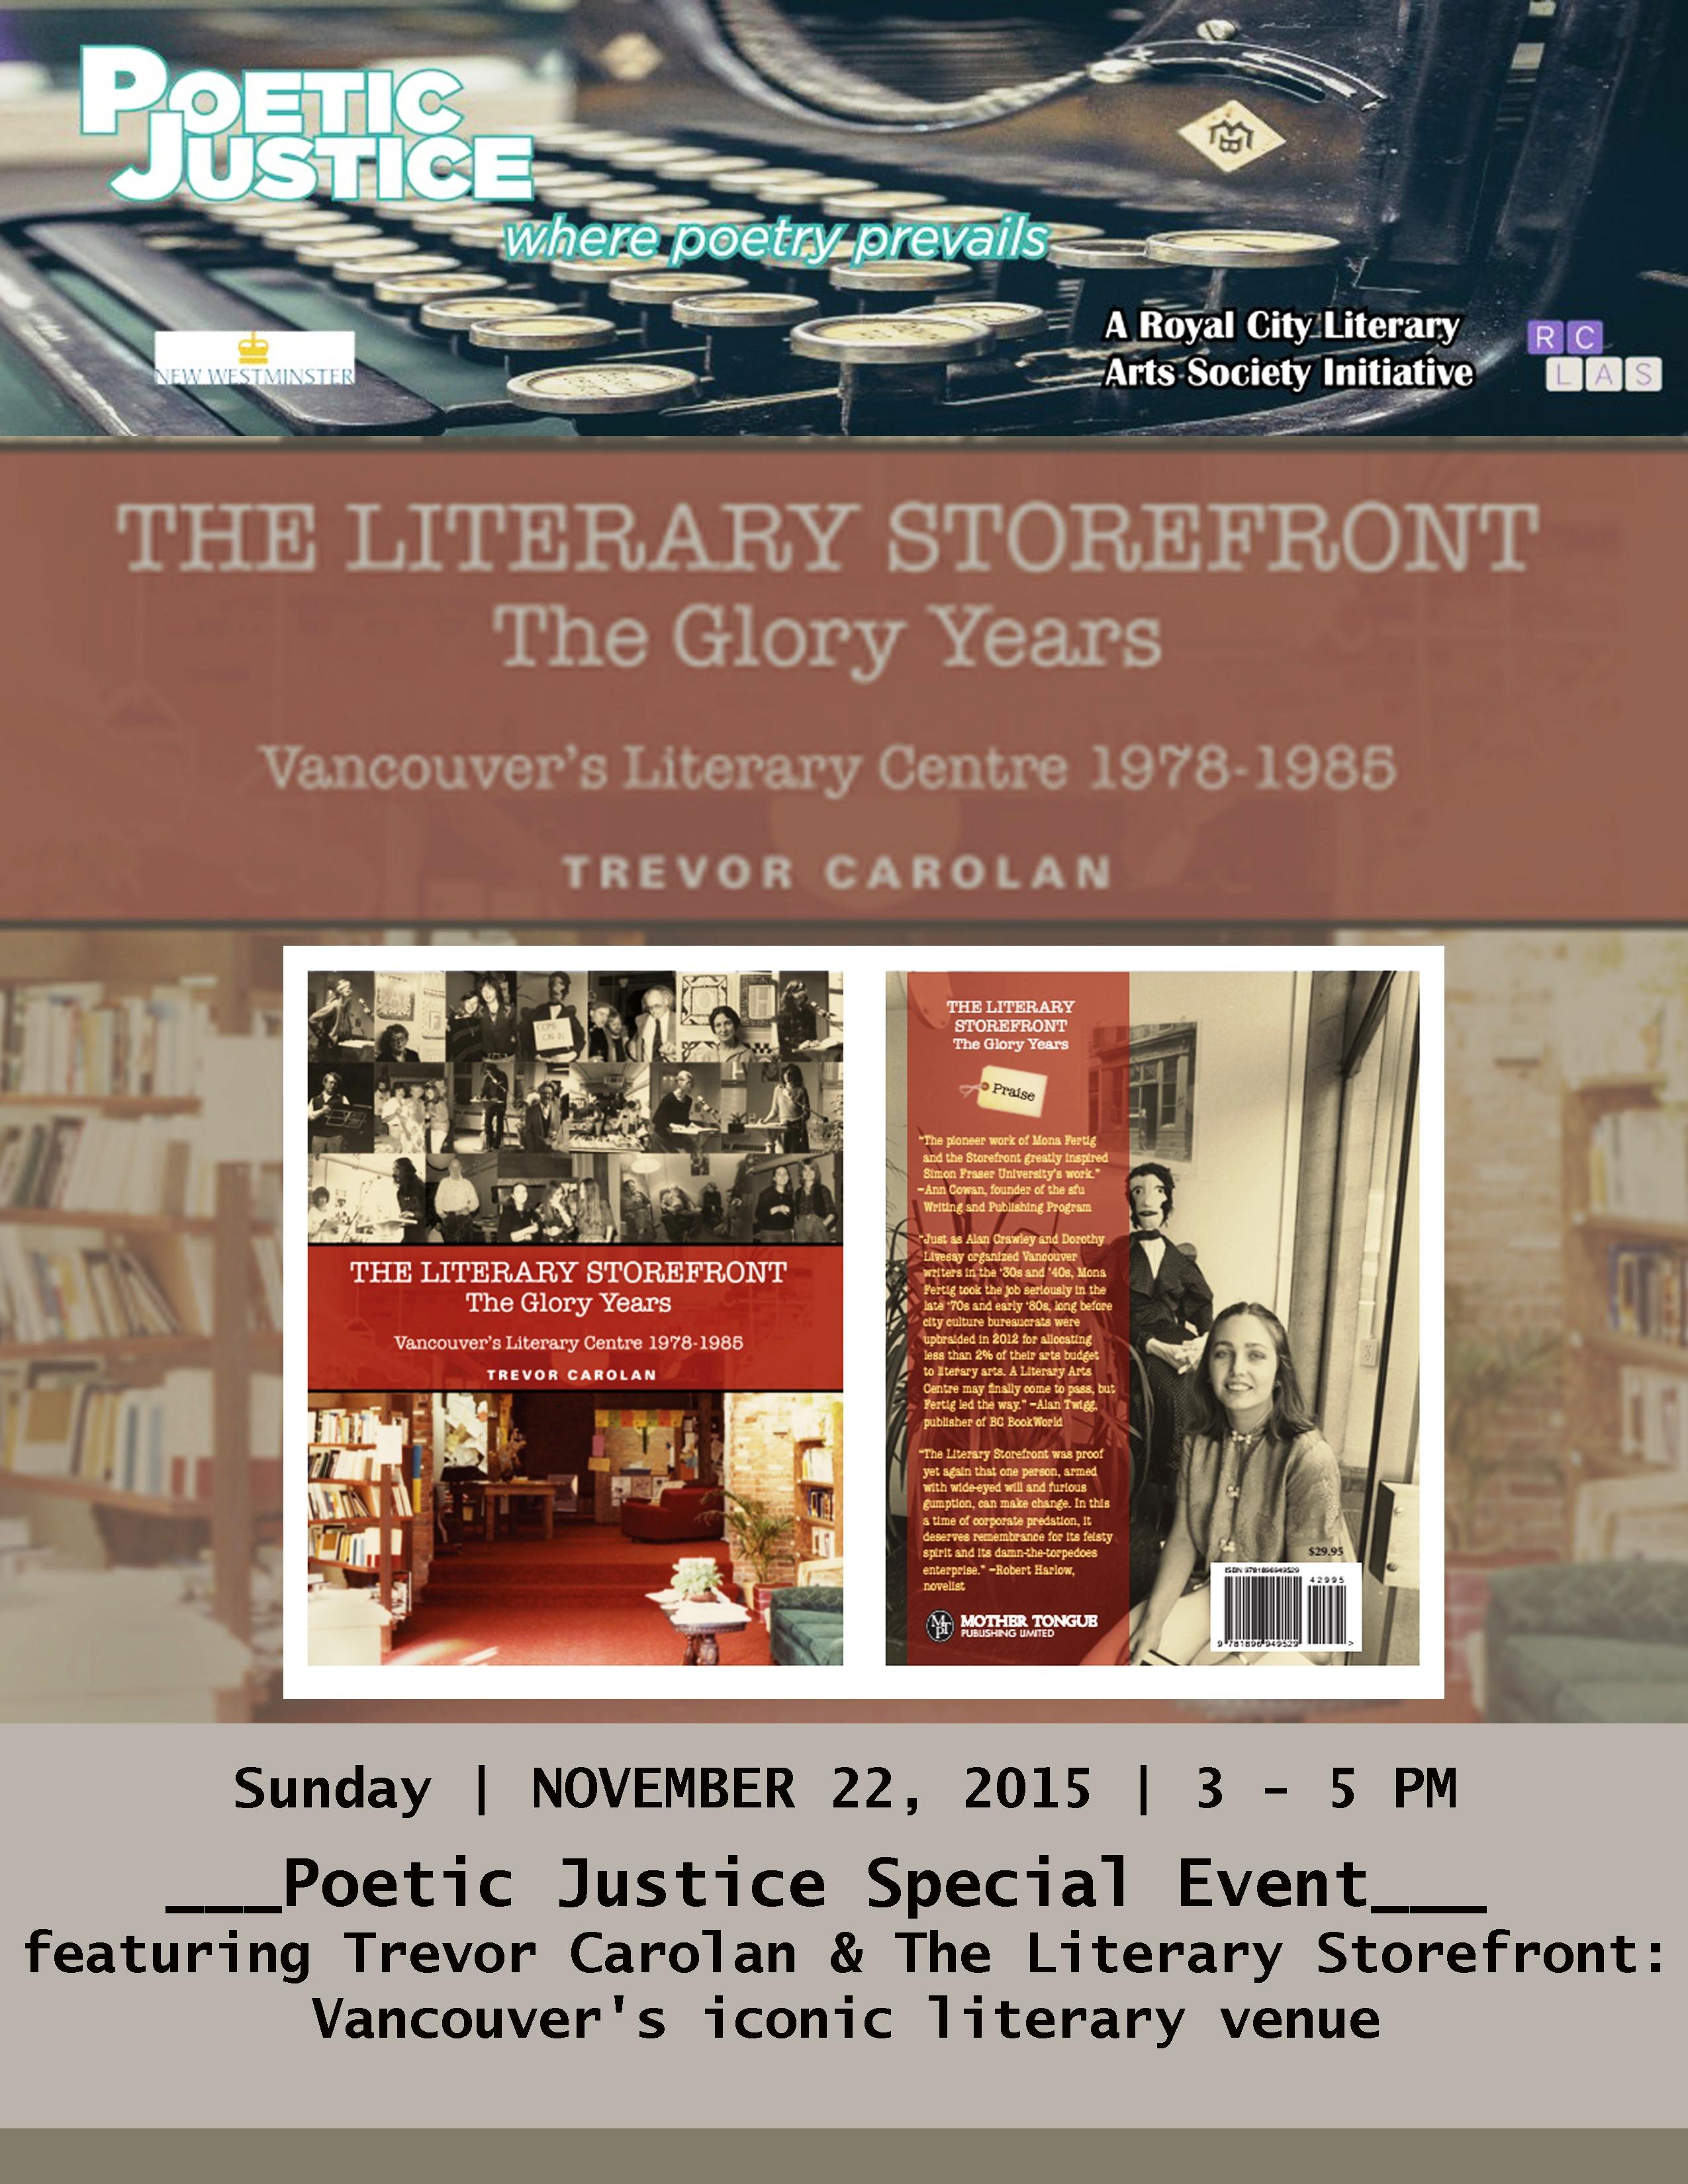 PJ NOV 22 2015_Literary Storefront